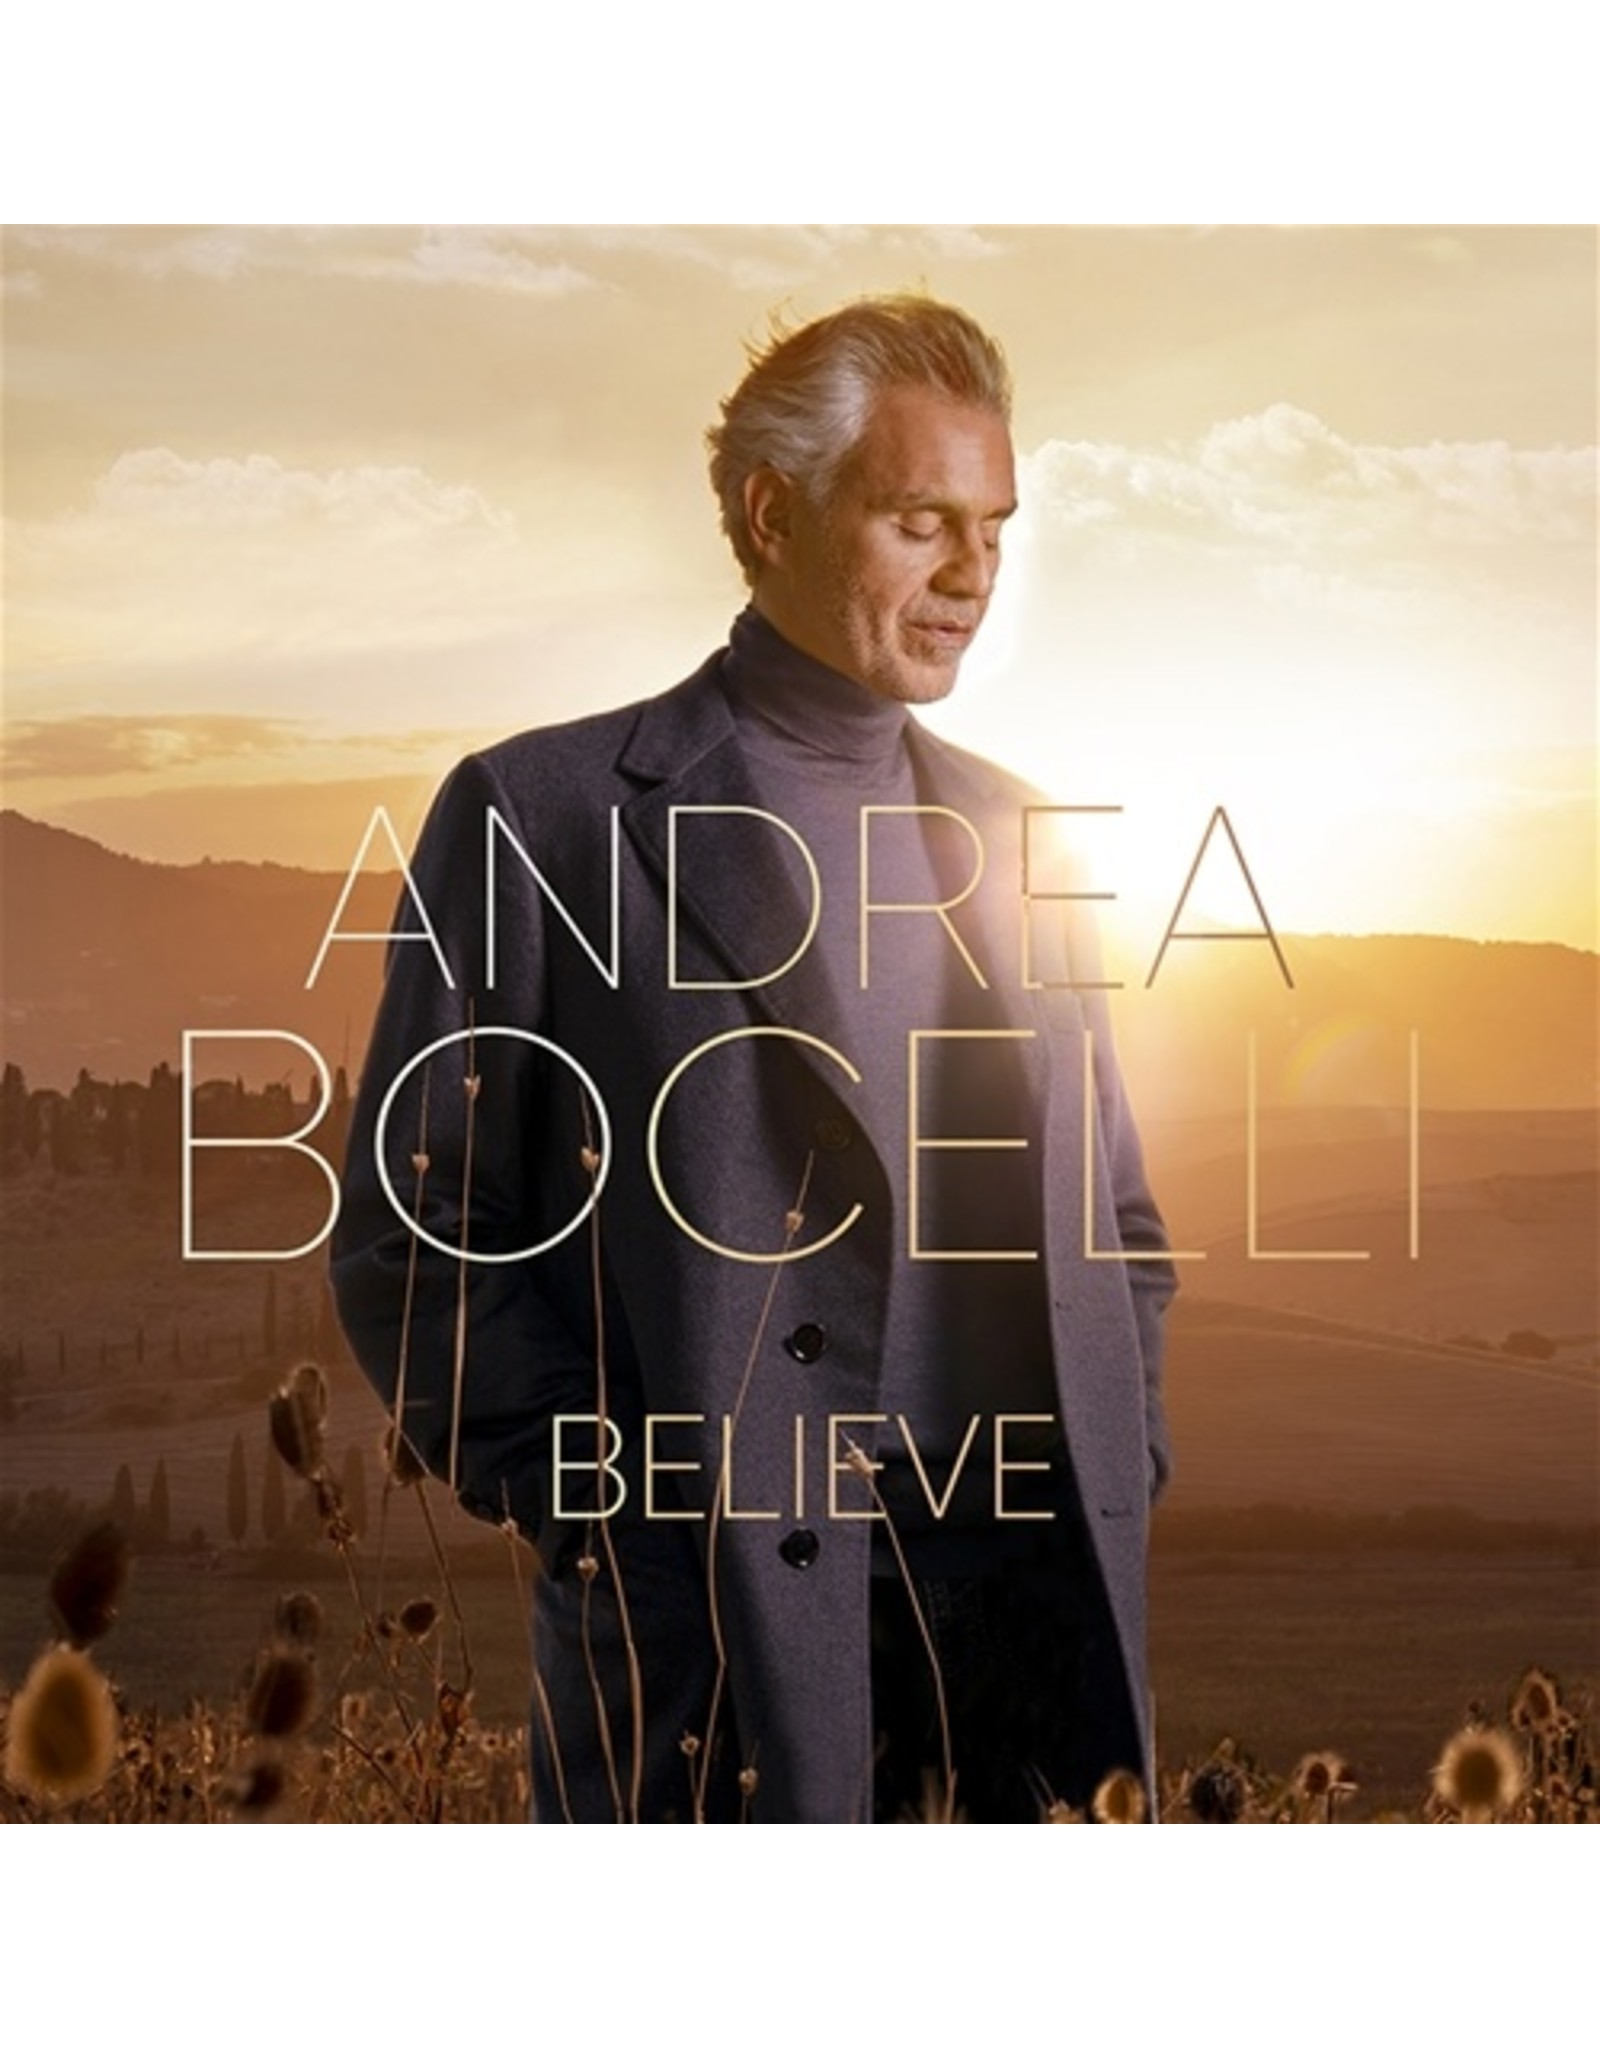 Believe CD - Andrea Bocelli